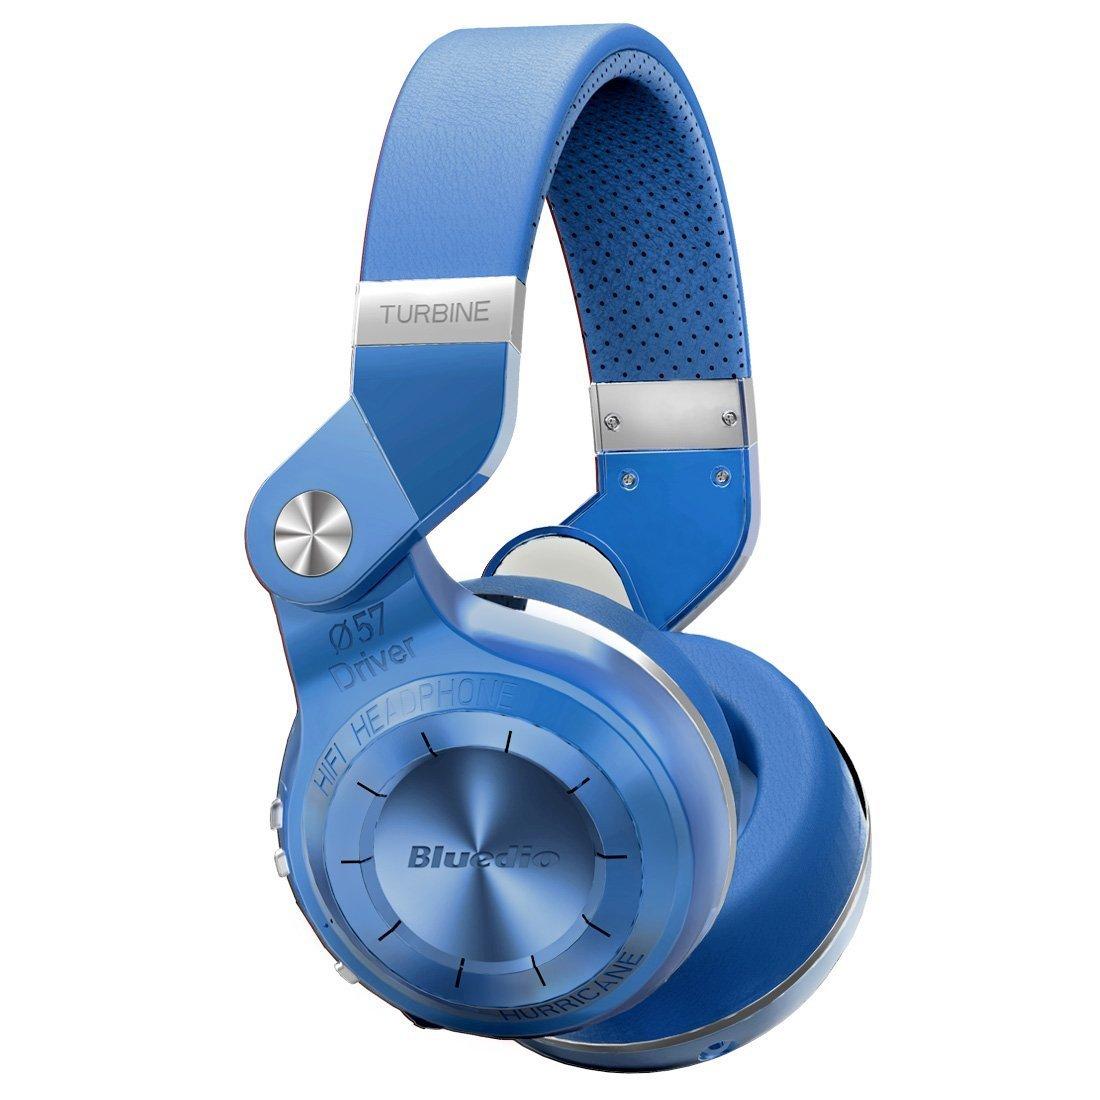 Bluedio T2S Turbine 2 Shooting Brake Bluetooth Stereo Headphones Wireless Headphones Bluetooth 4.1 Headset Hurrican Series Over The Ear Headphones Blue